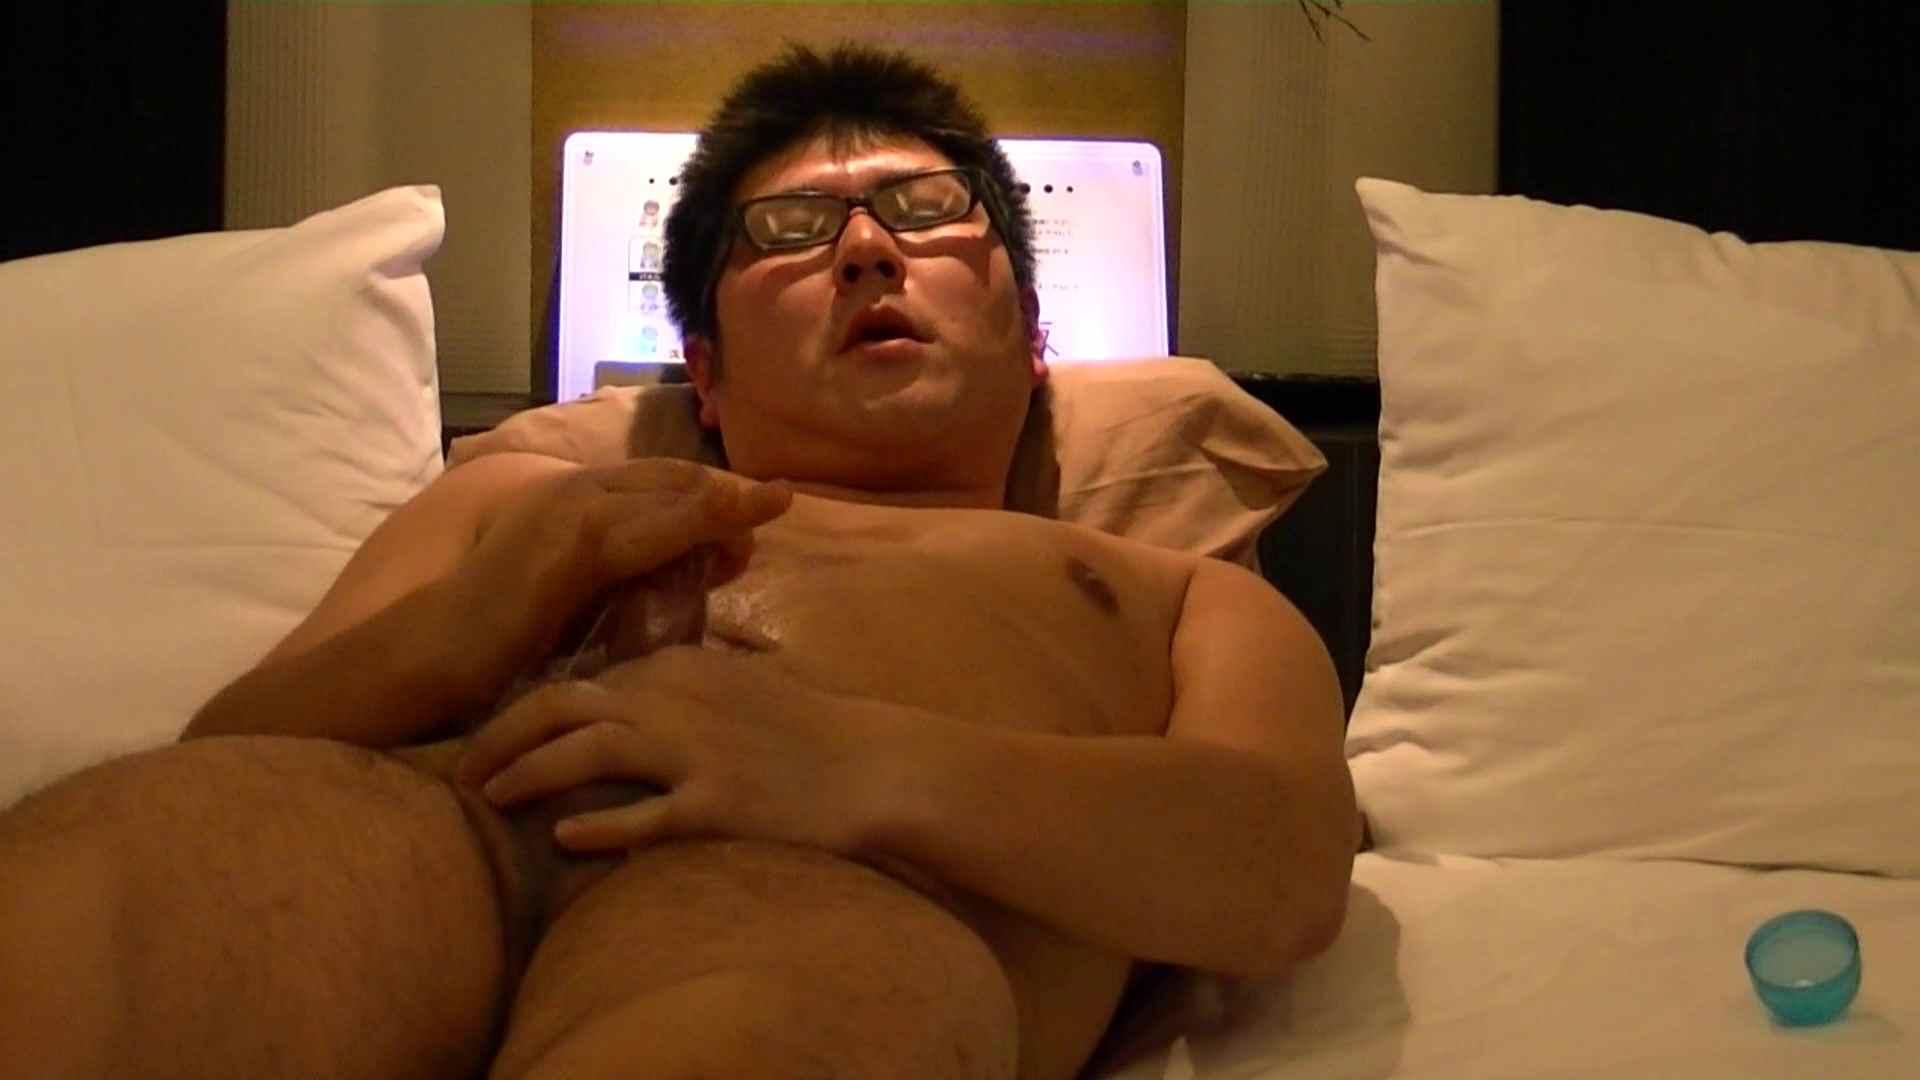 Mr.オナックスさん投稿!HD 貴方のオナニー三万円で撮影させてください。VOL.03 後編 完全無修正版  106枚 84